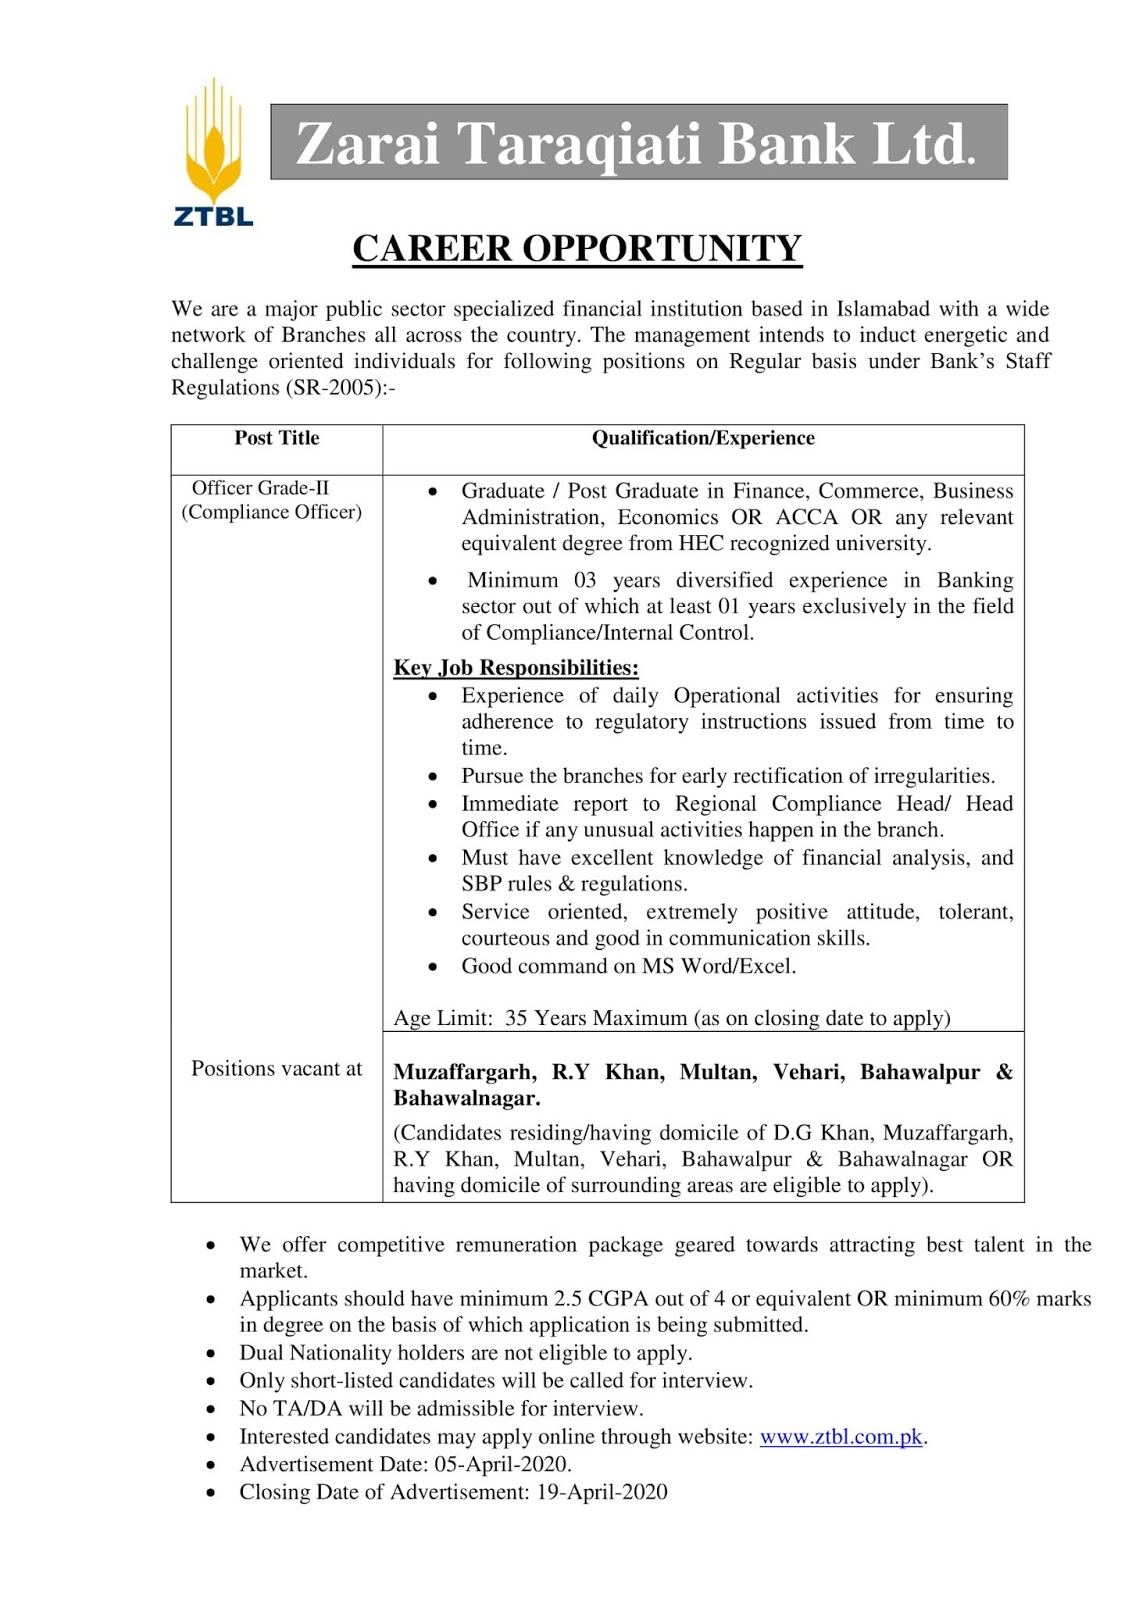 ZTBL Jobs,Jobs in ZTBL 2020 Zarai Taraqiati Bank for Officer Grade